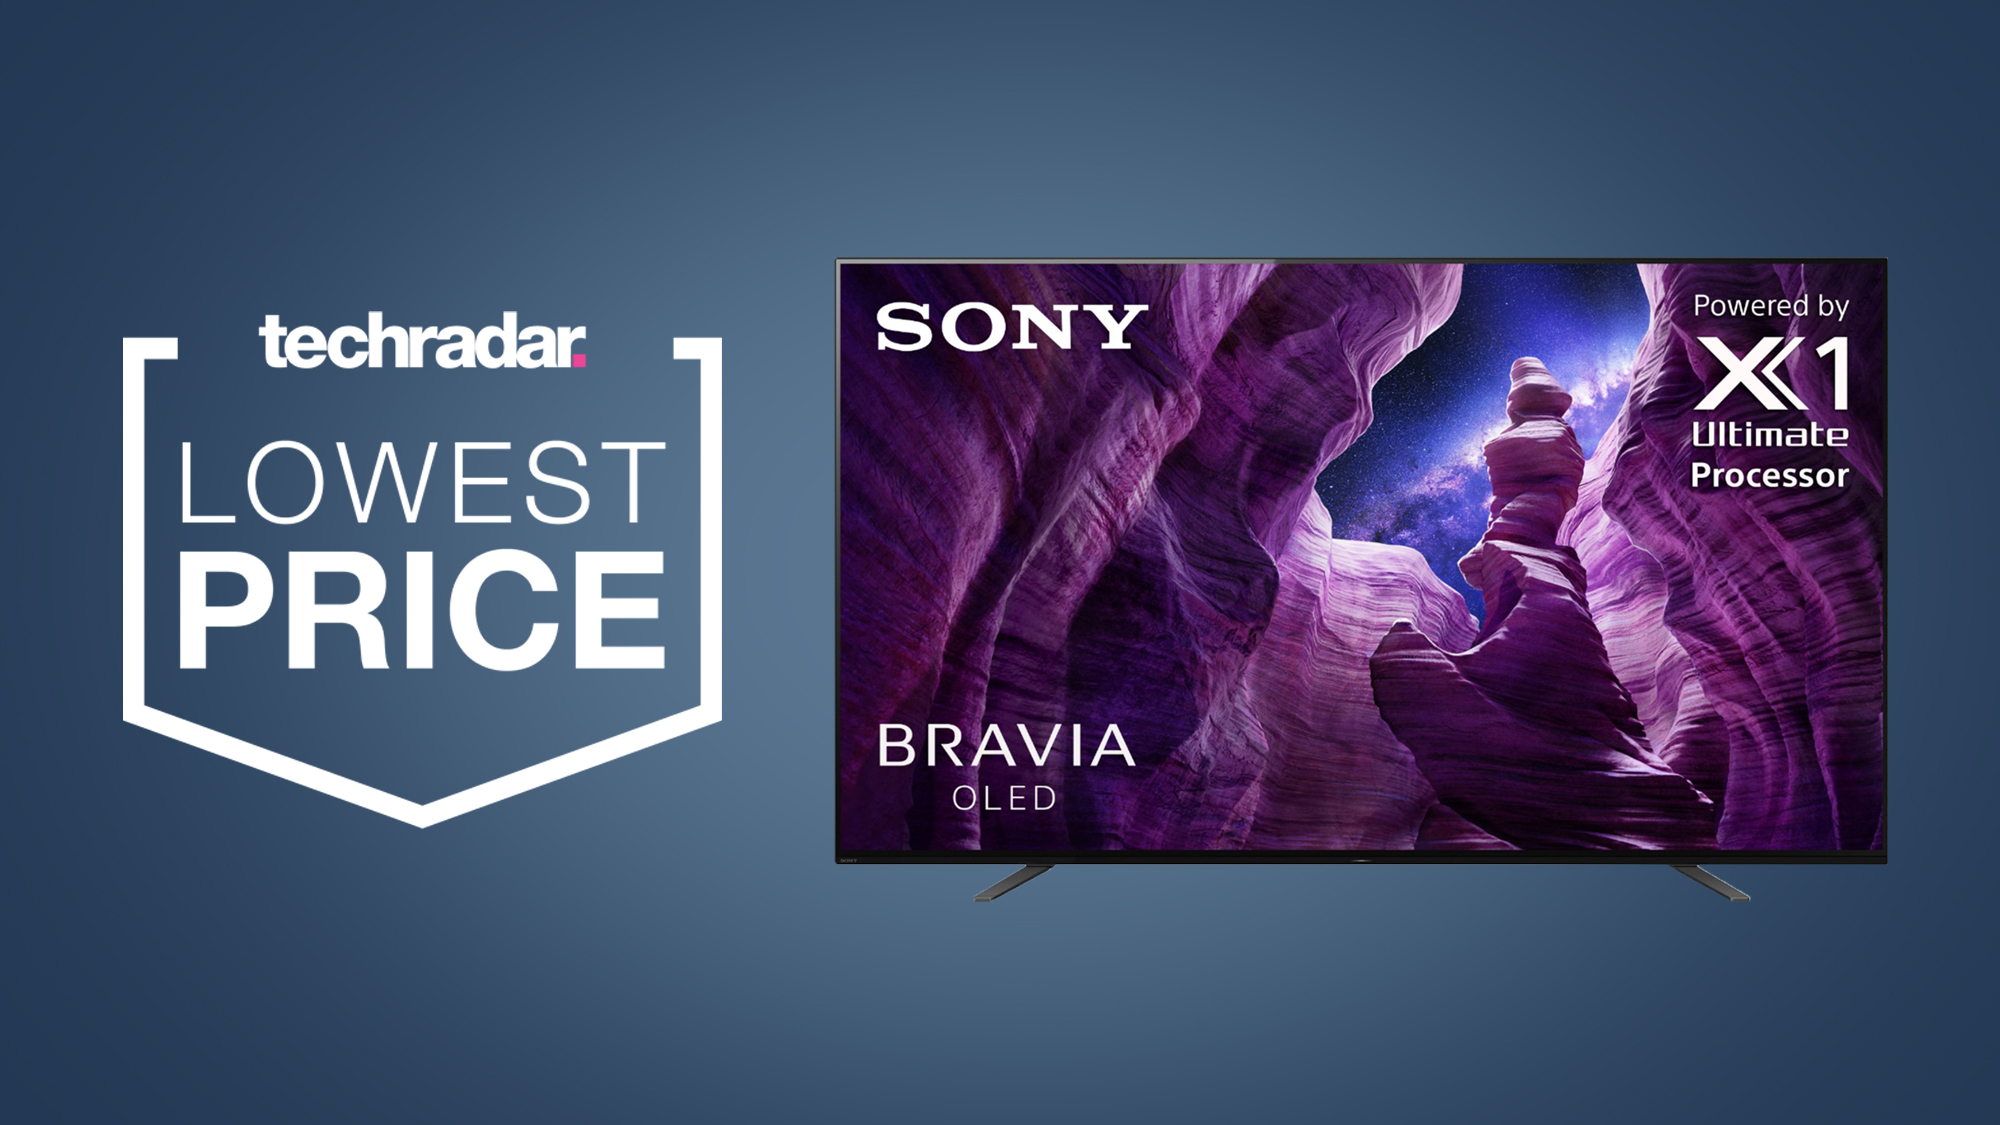 Techradar Sony Direct